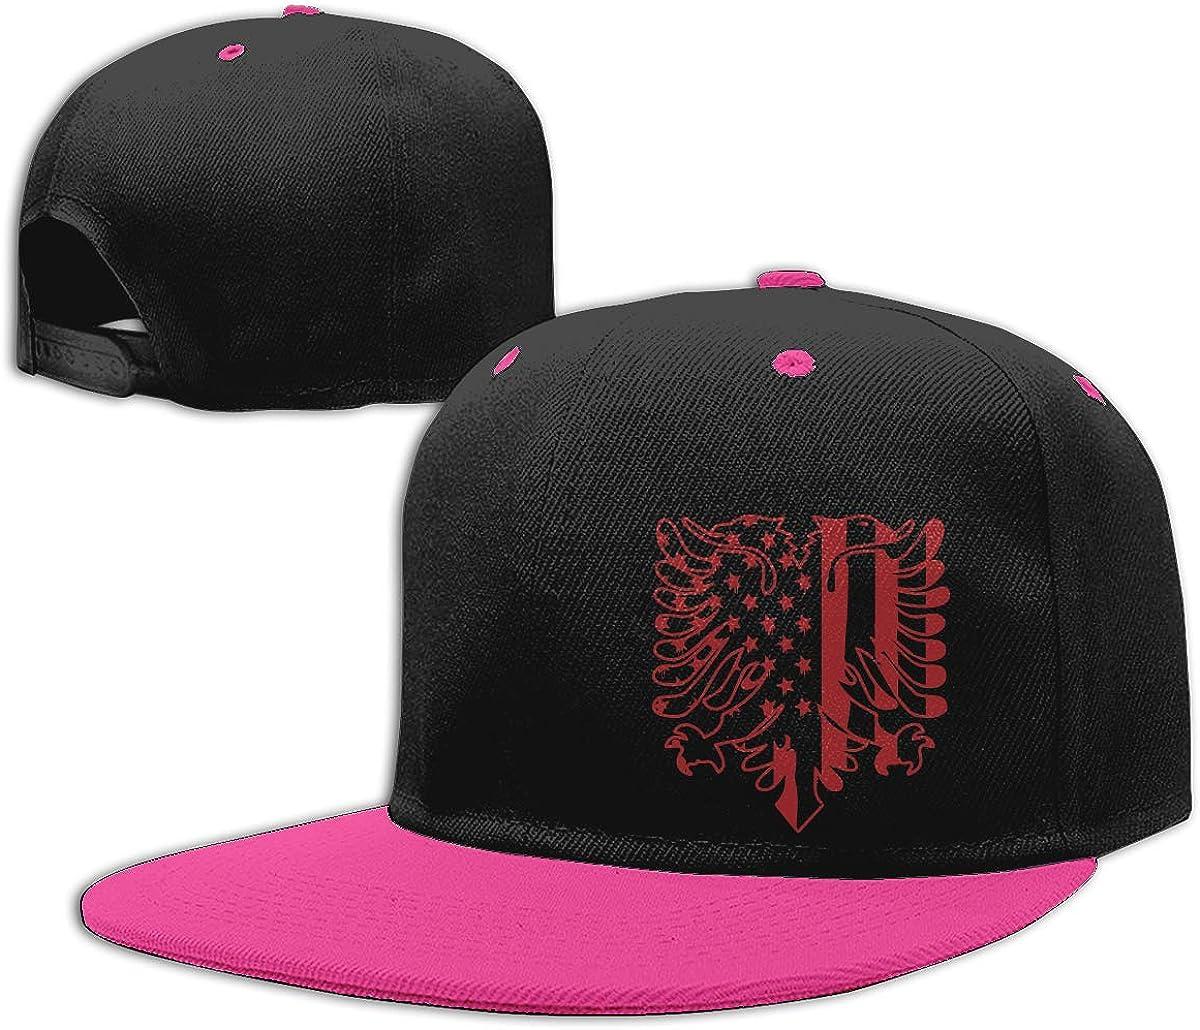 Albania America Flag Classic Hip-Hop Baseball Caps Men and Women Hiphop Cap